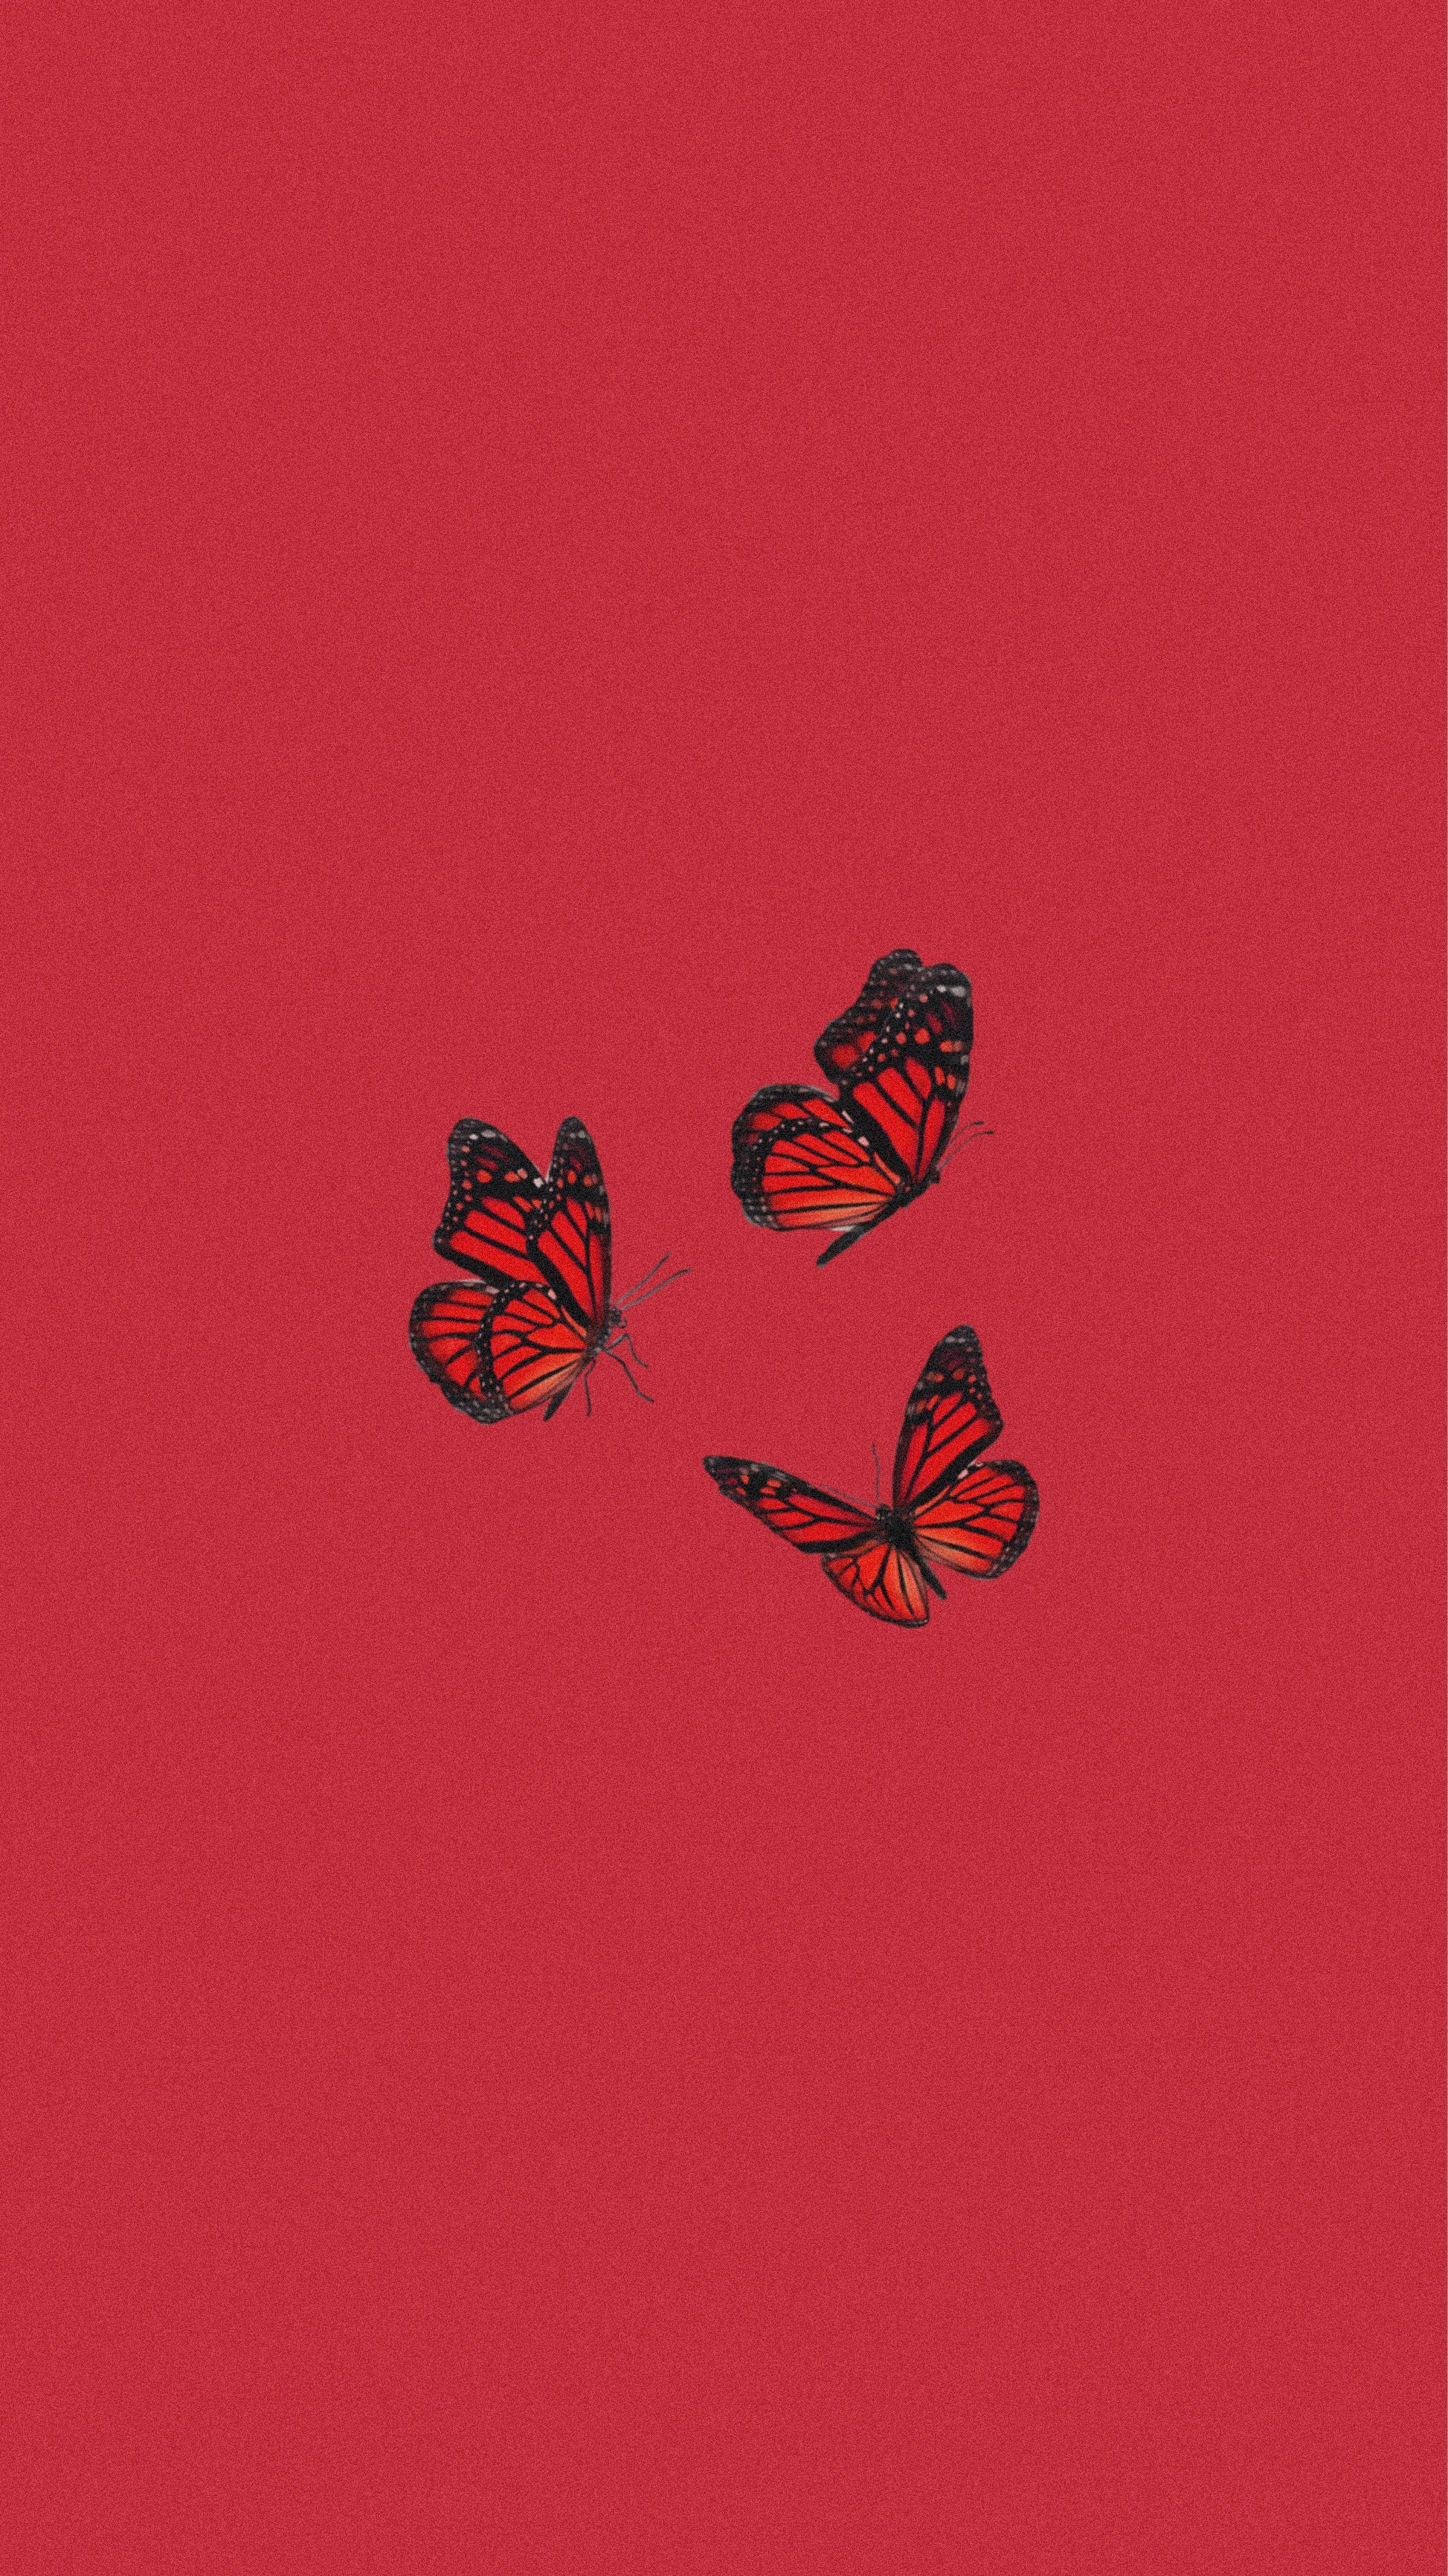 Butterfly Wallpaper In 2020 Butterfly Wallpaper Iphone Butterfly Wallpaper Edgy Wallpaper